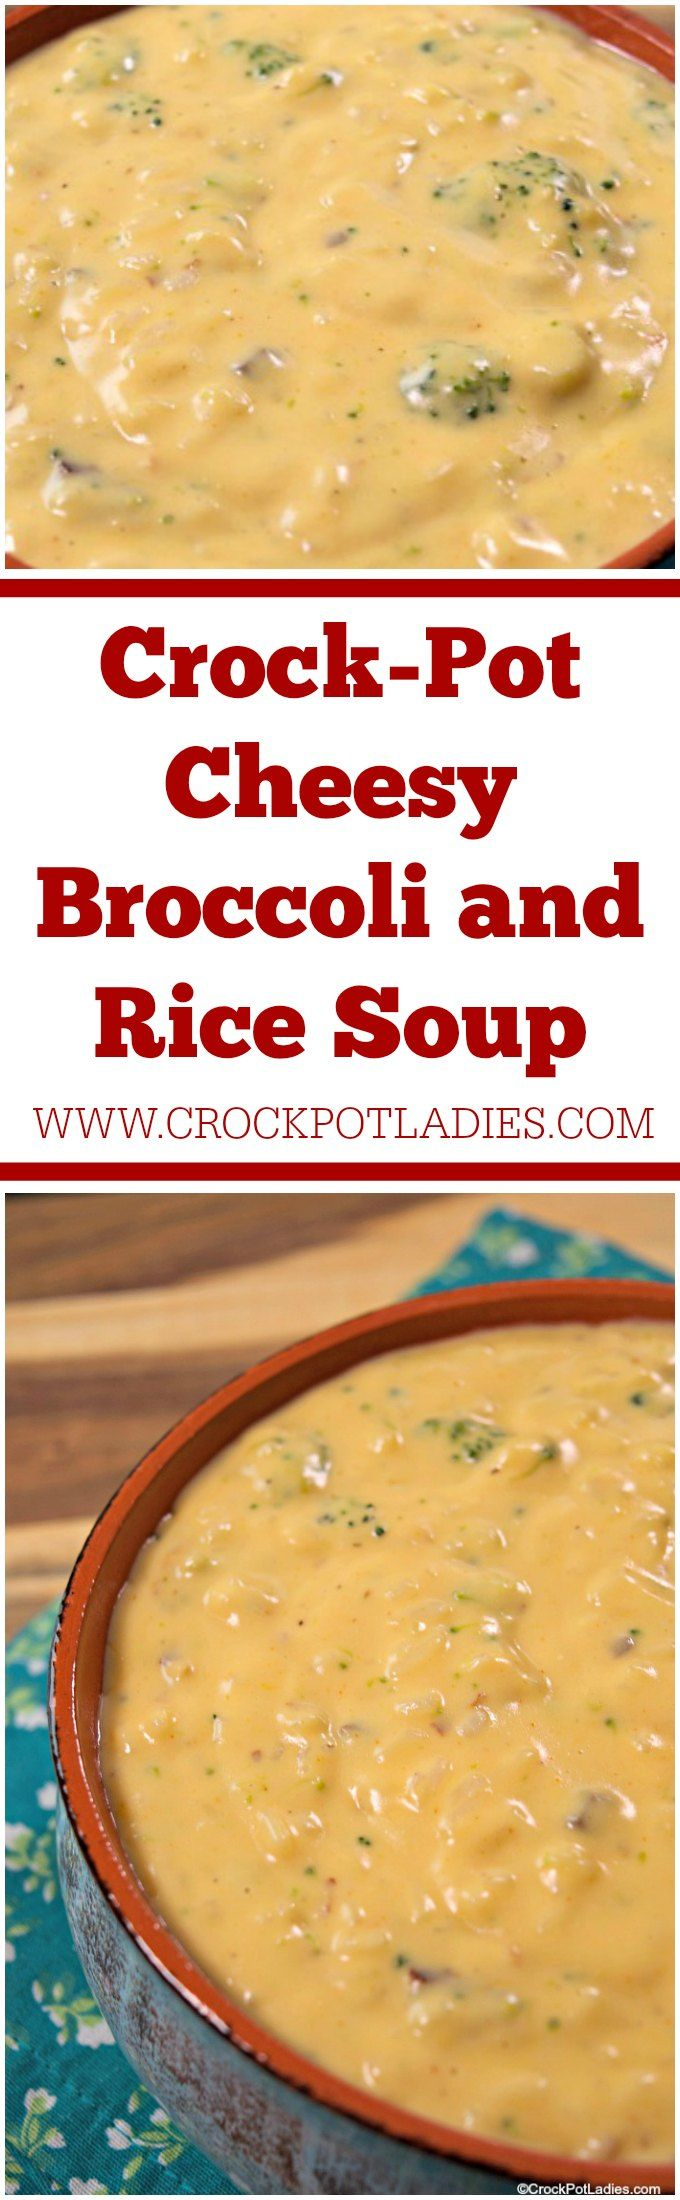 CrockPot Cheesy Broccoli and Rice Soup Recipe Easy